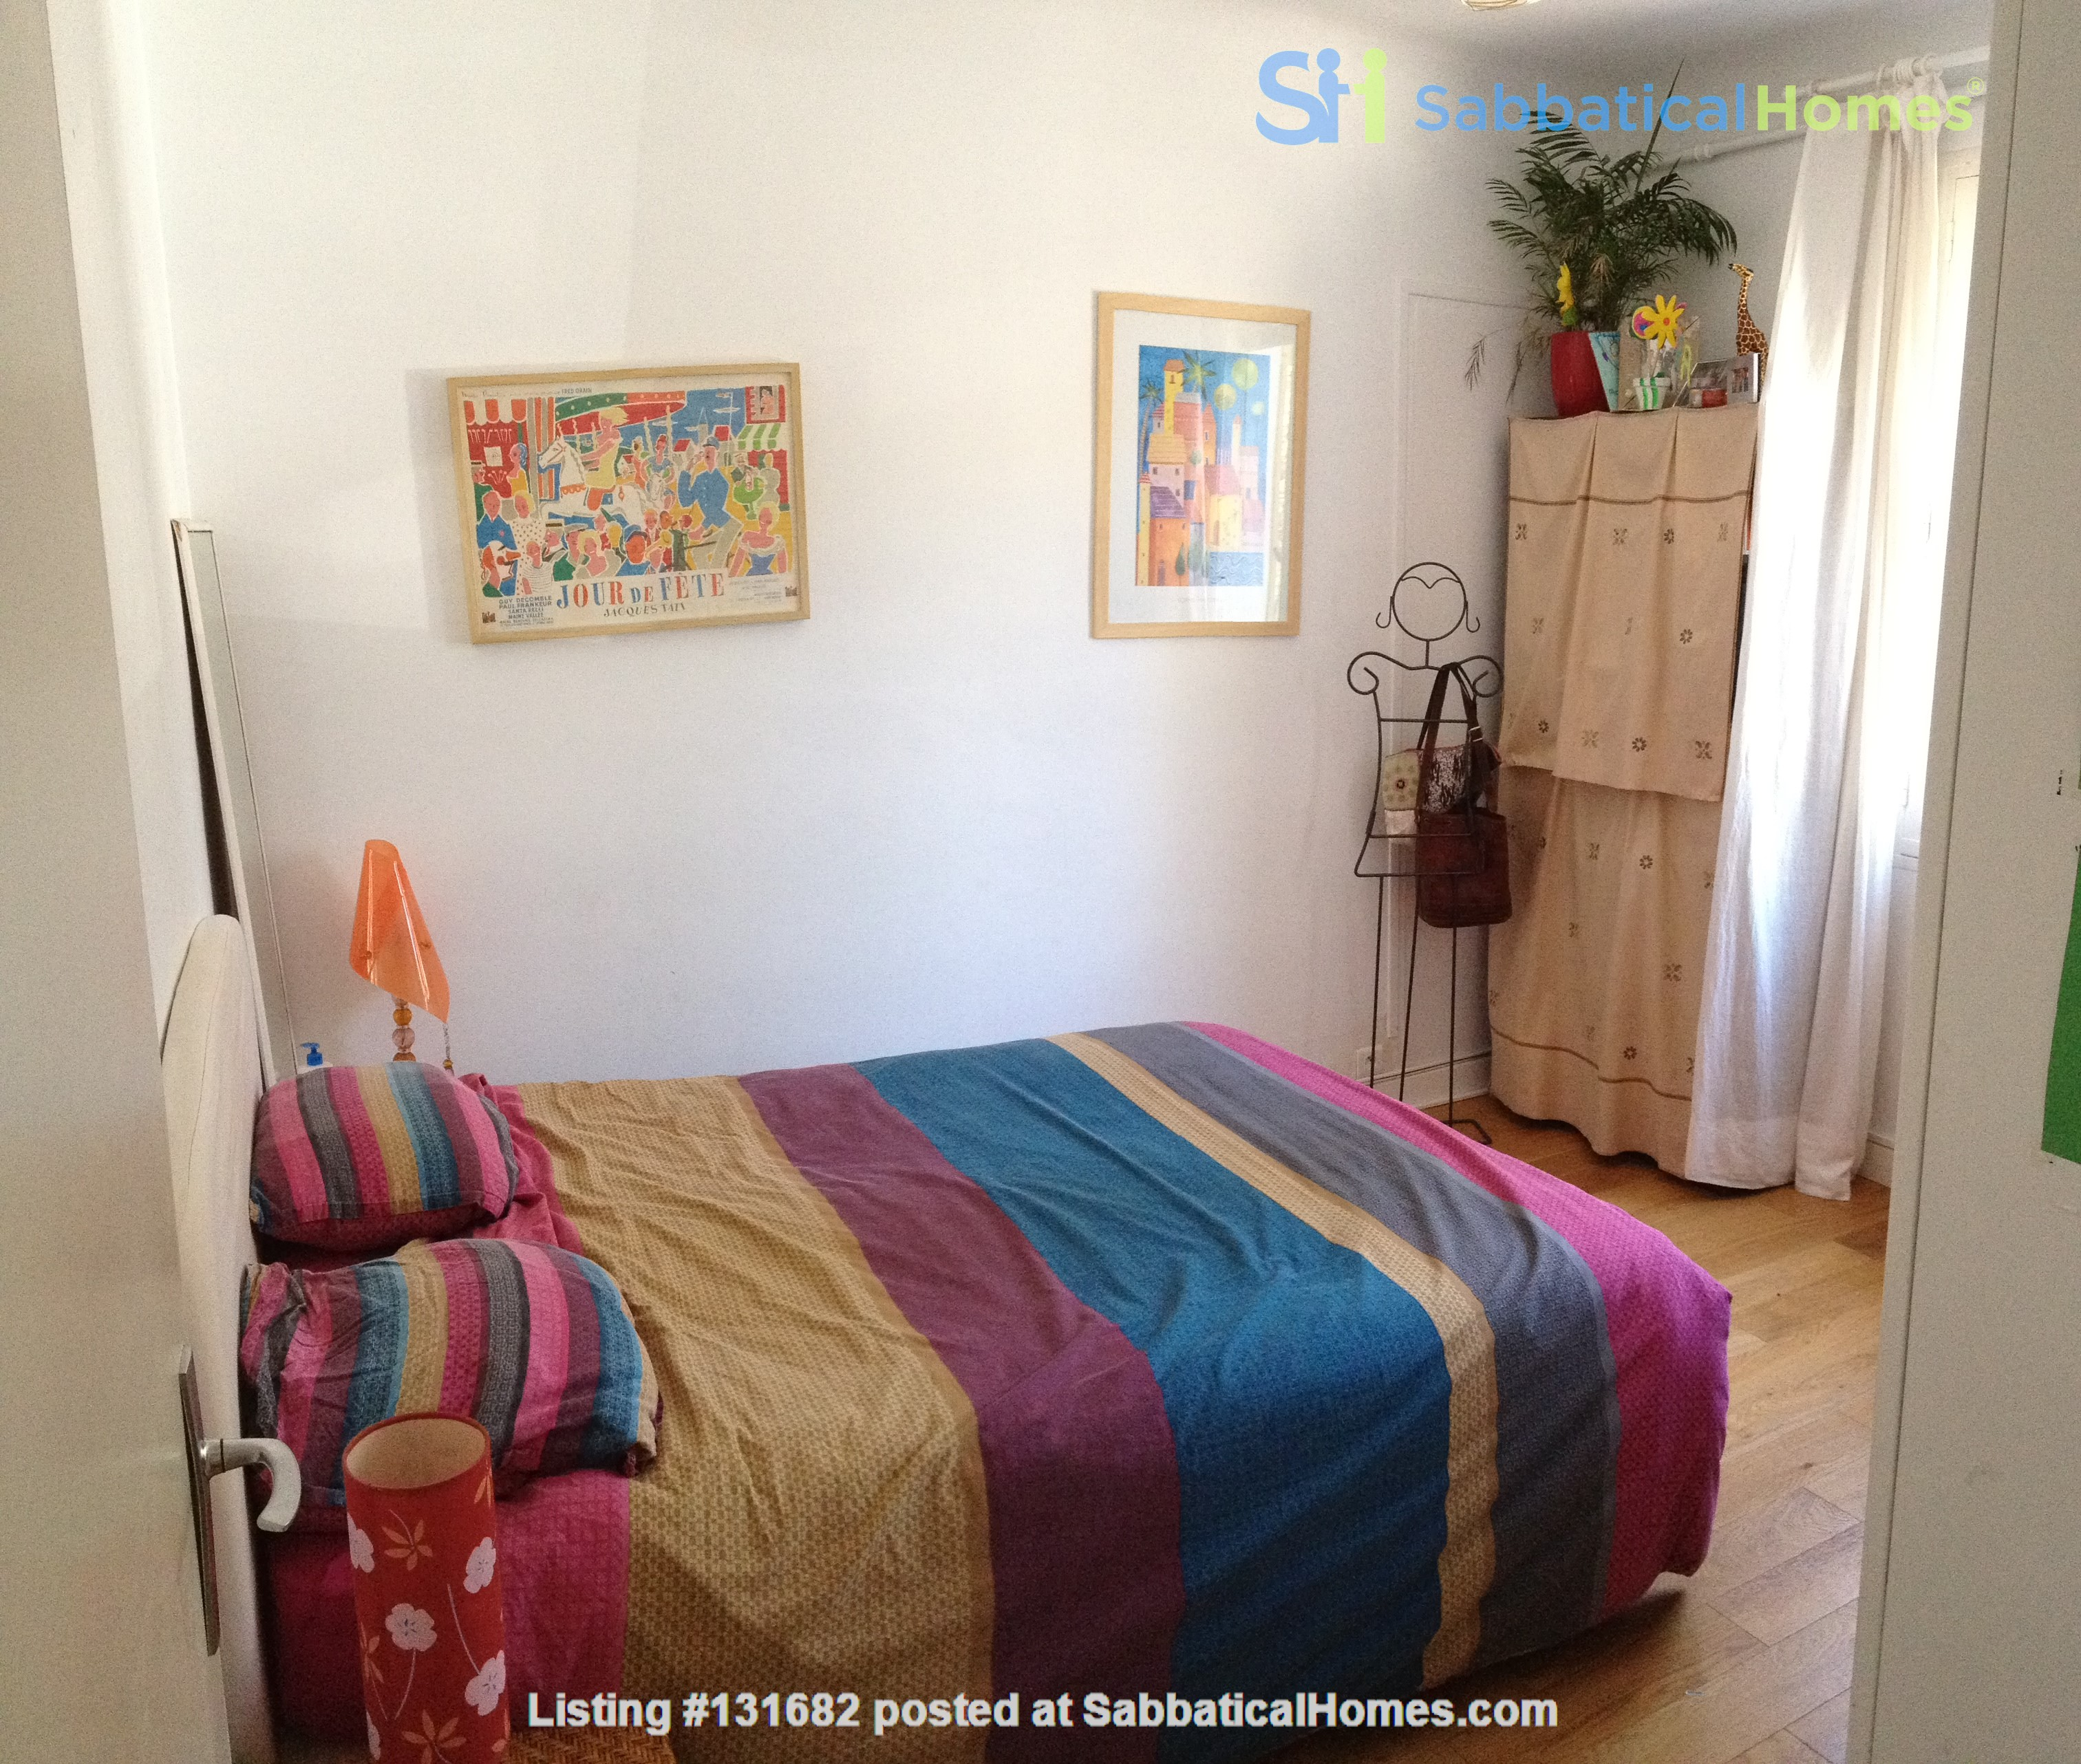 Full Family House in Montpellier Home Rental in Montpellier, Occitanie, France 4